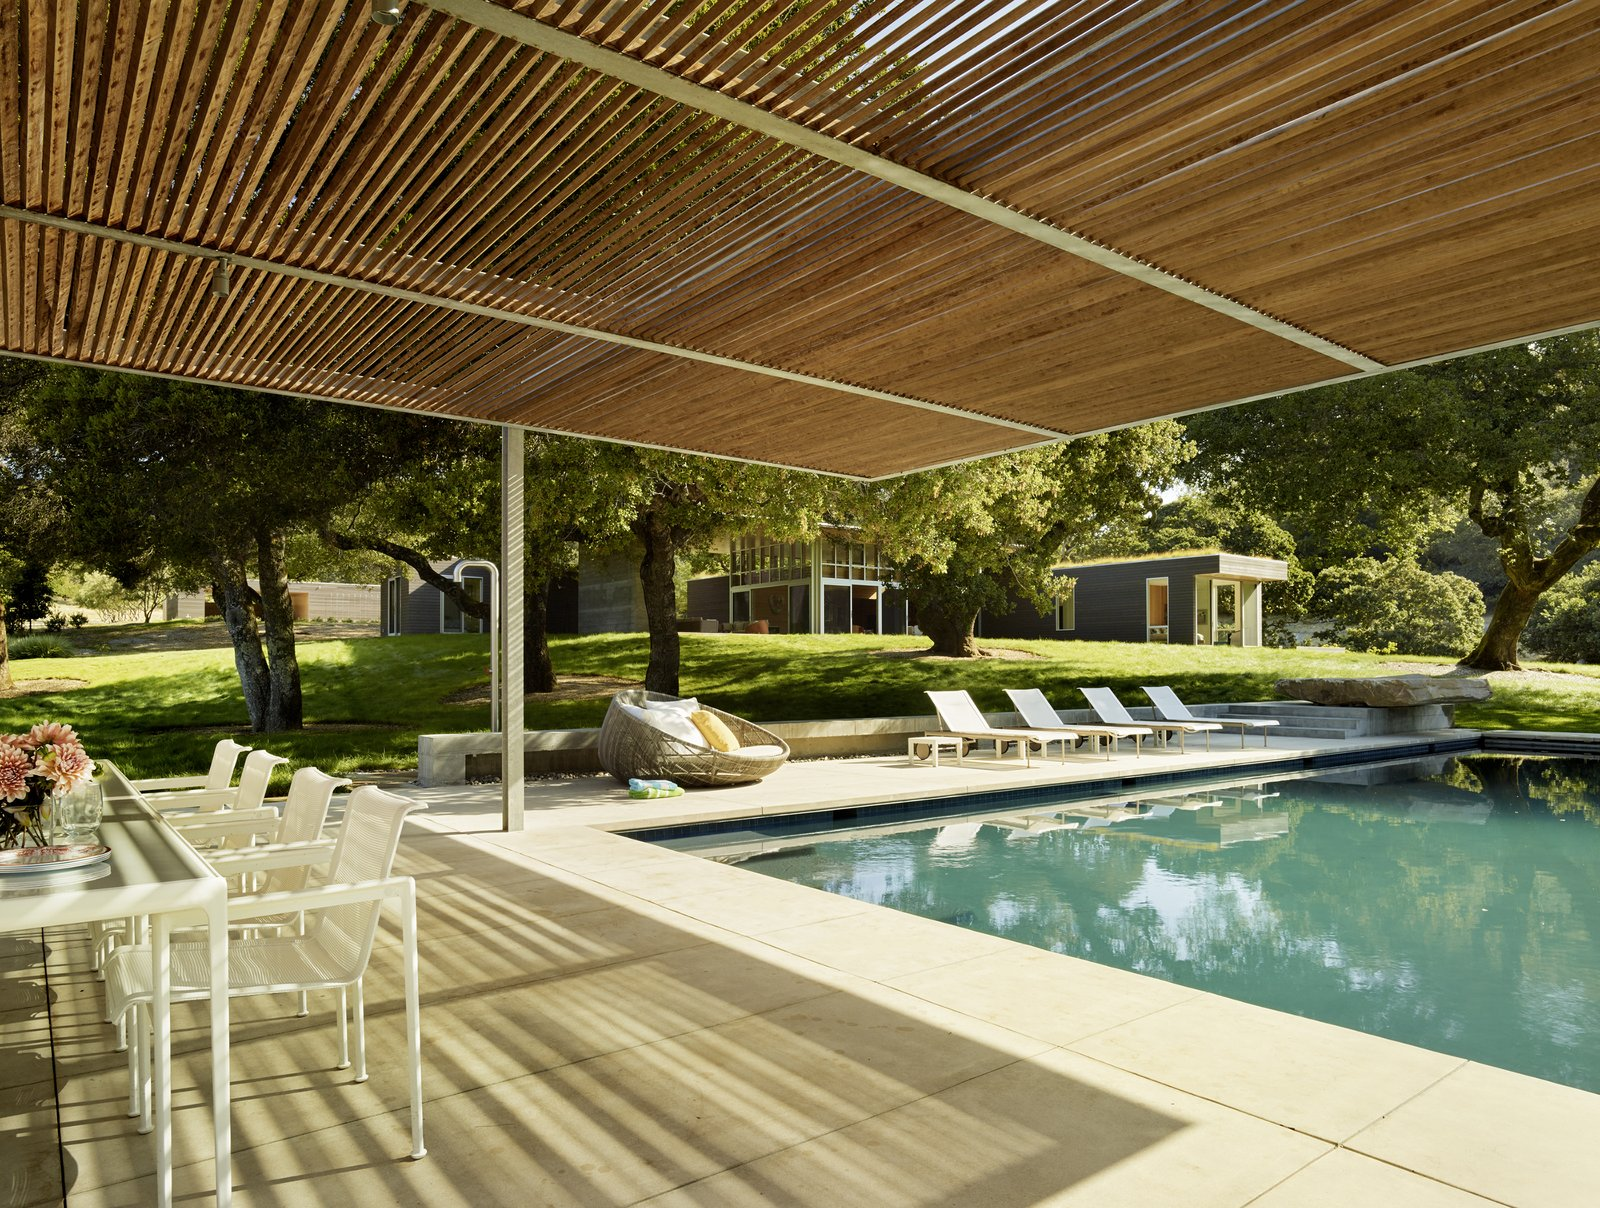 #TurnbullGriffinHaesloop #exterior #pool #shading  Sonoma Residence by Turnbull Griffin Haesloop Architects